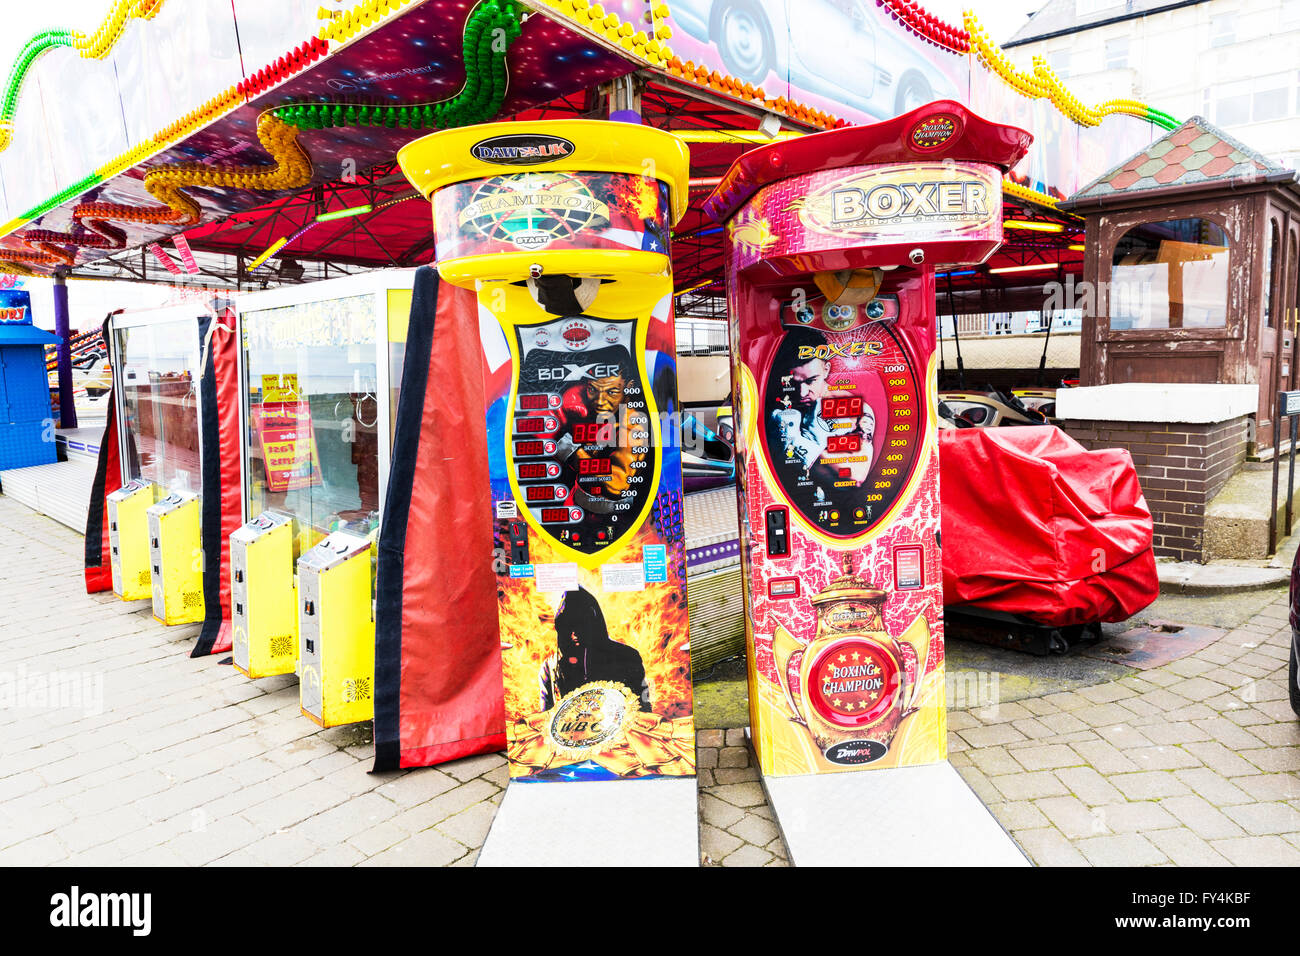 Punch bag fairground punching game machine machines Bridlington Yorkshire UK England coastal town towns - Stock Image